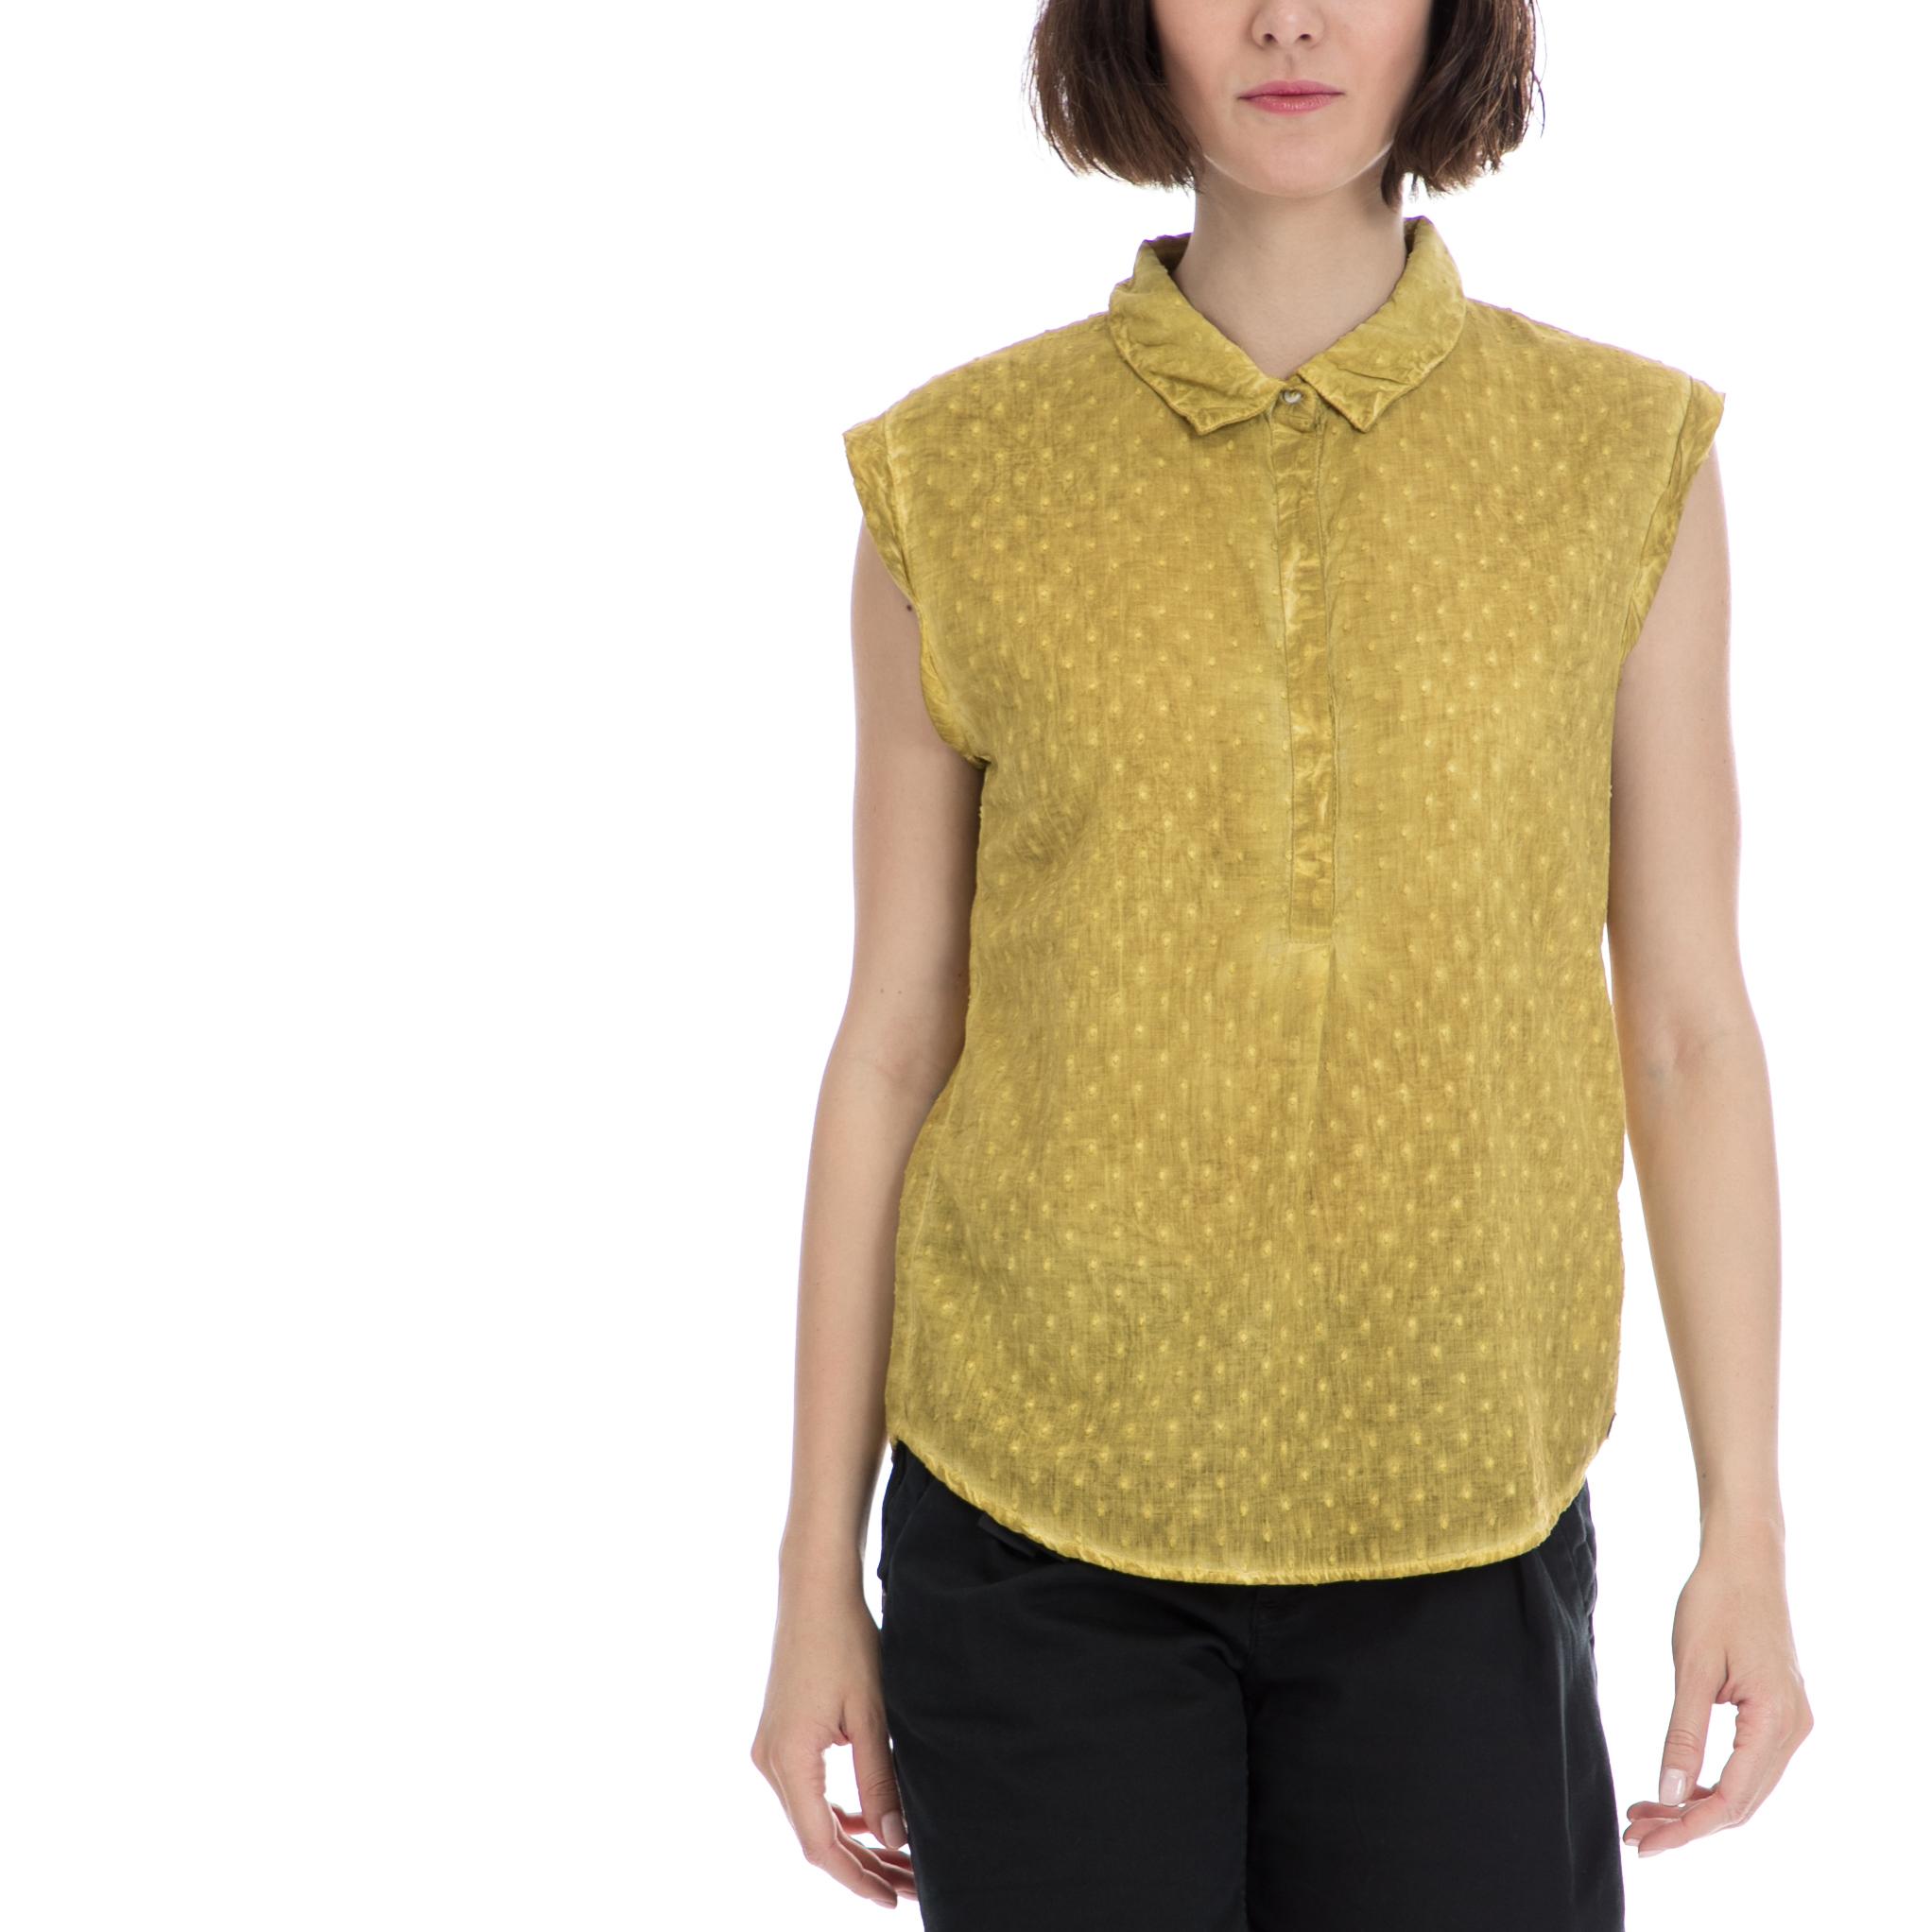 GARCIA JEANS - Γυναικείο πουκάμισο Garcia Jeans κίτρινο γυναικεία ρούχα πουκάμισα κοντομάνικα αμάνικα